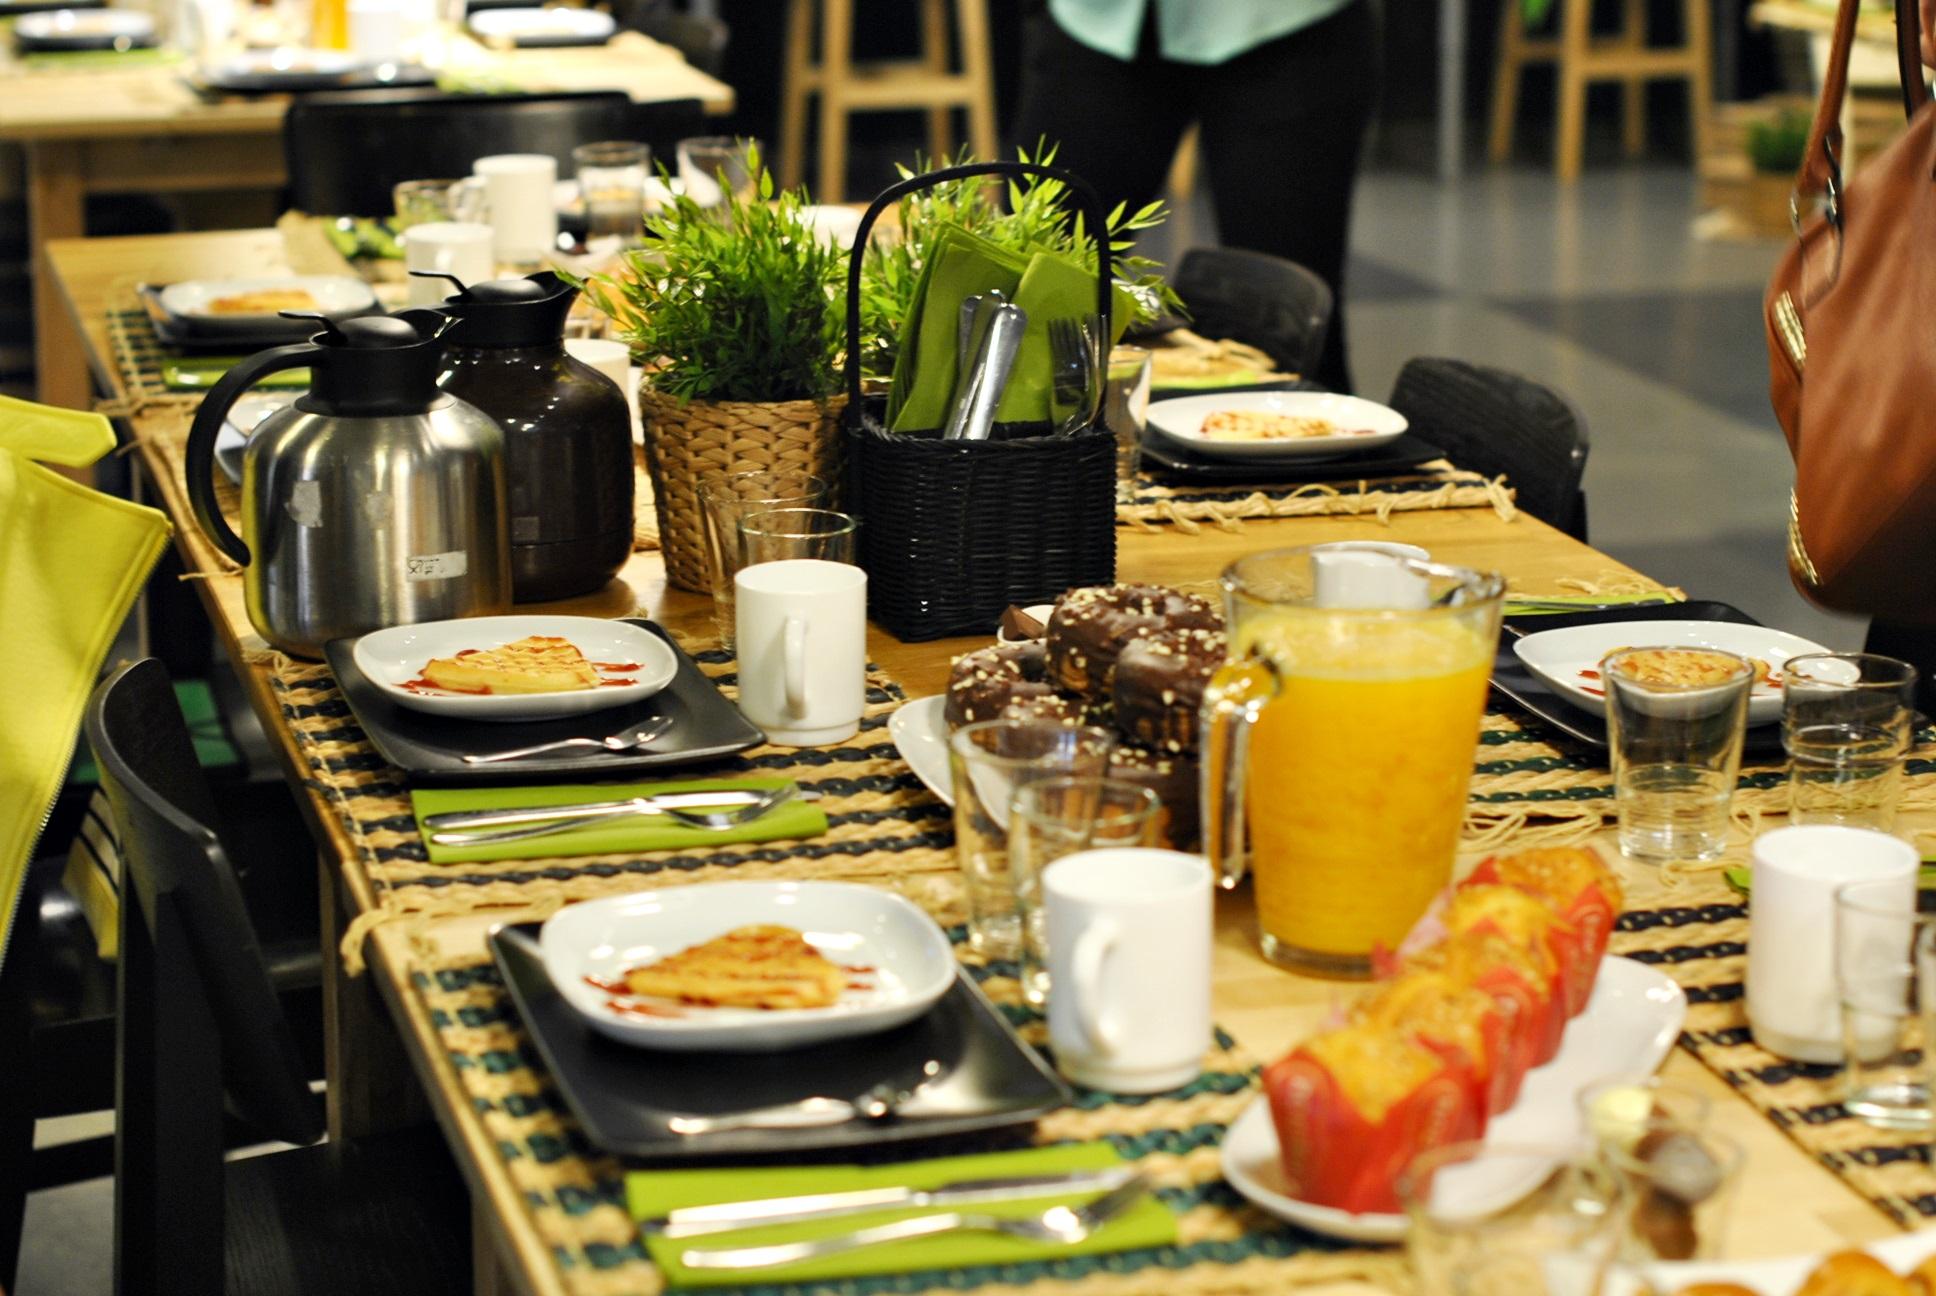 desayuno-blogger-ikea-02